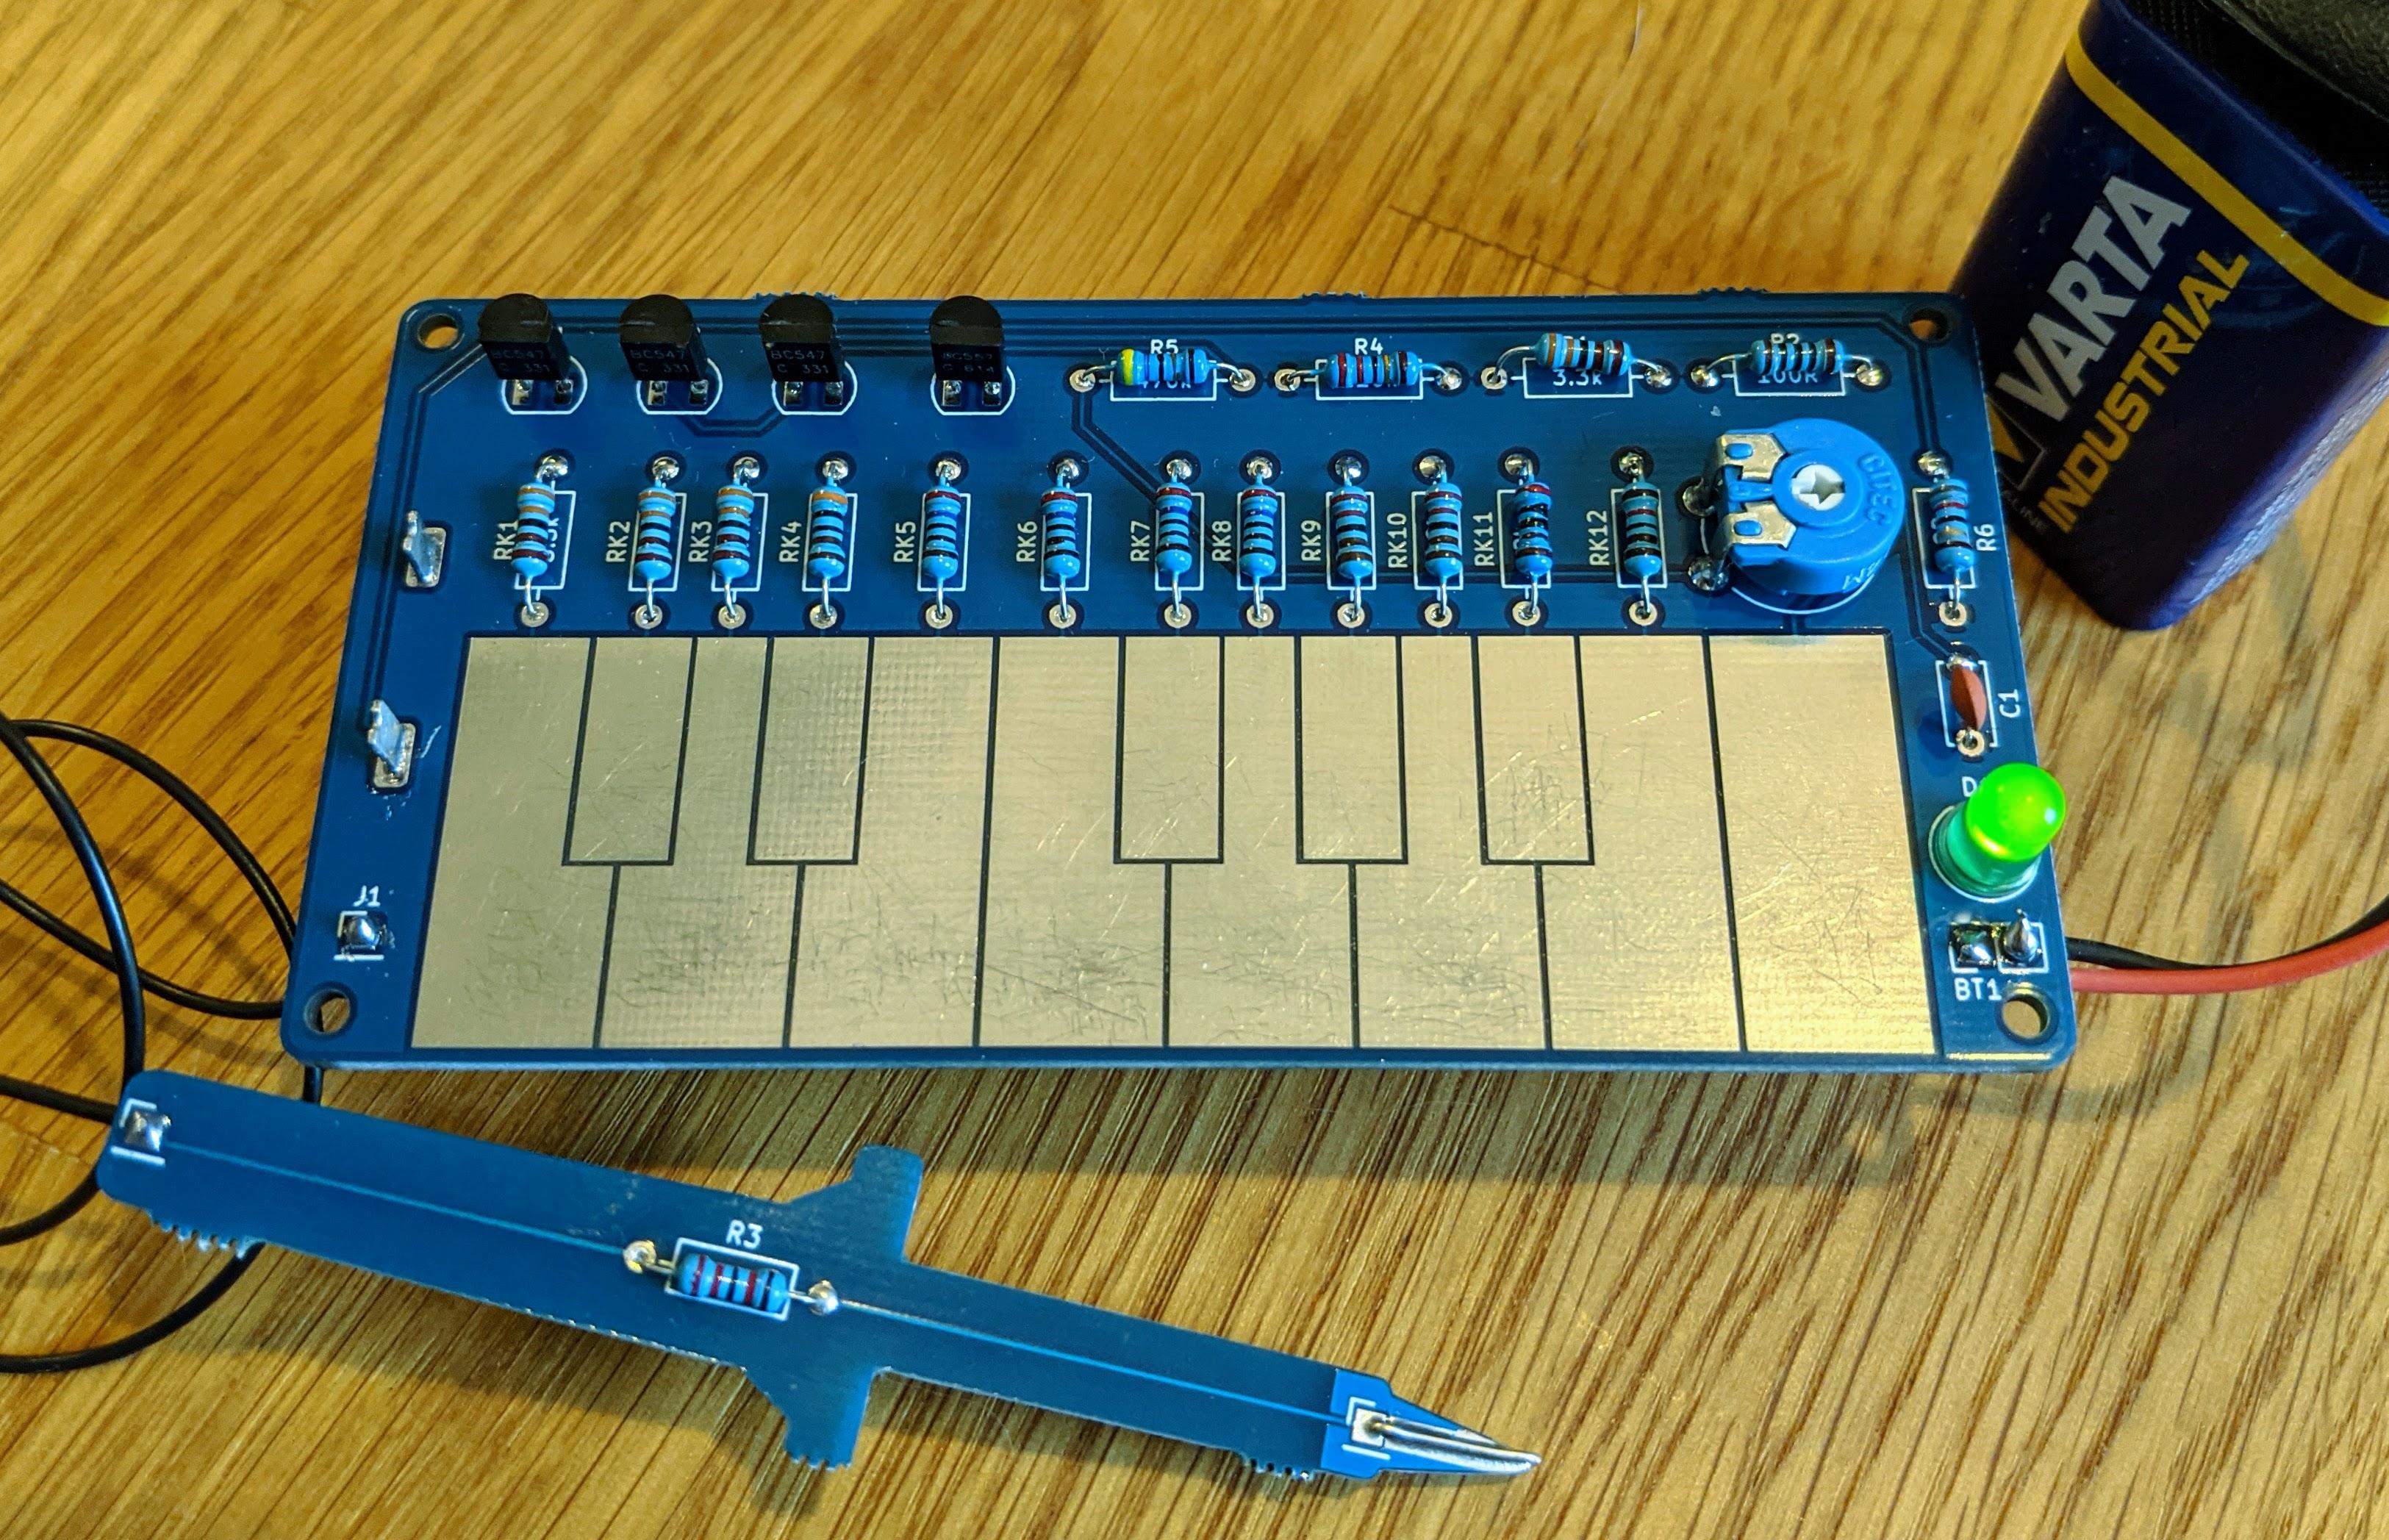 Sawtooth organ - Simple soldering kit for making music